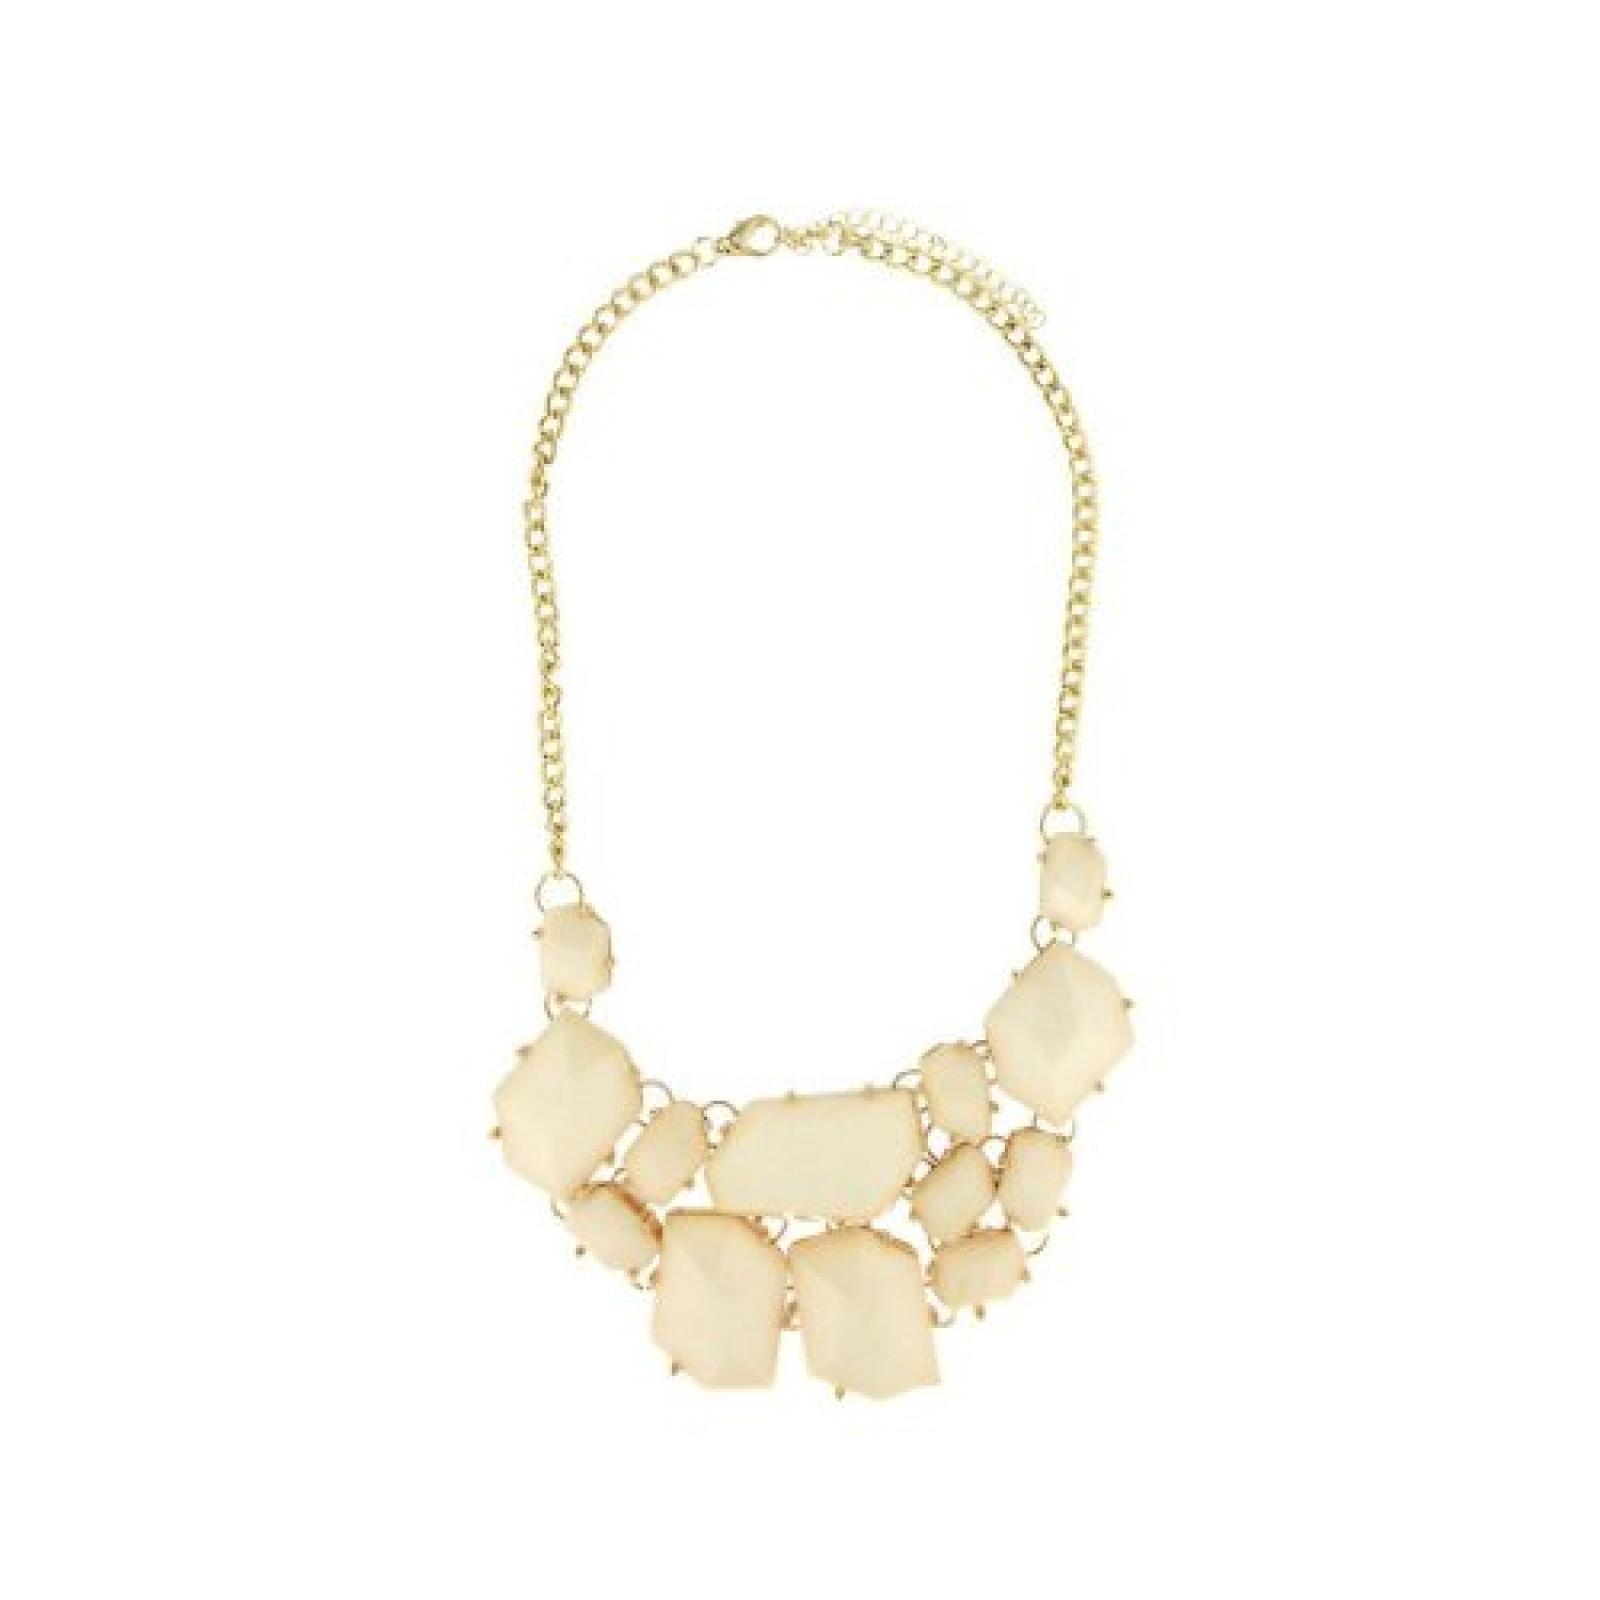 Sweet Deluxe Damen-Halskette Rita gold weiß Messing 2513